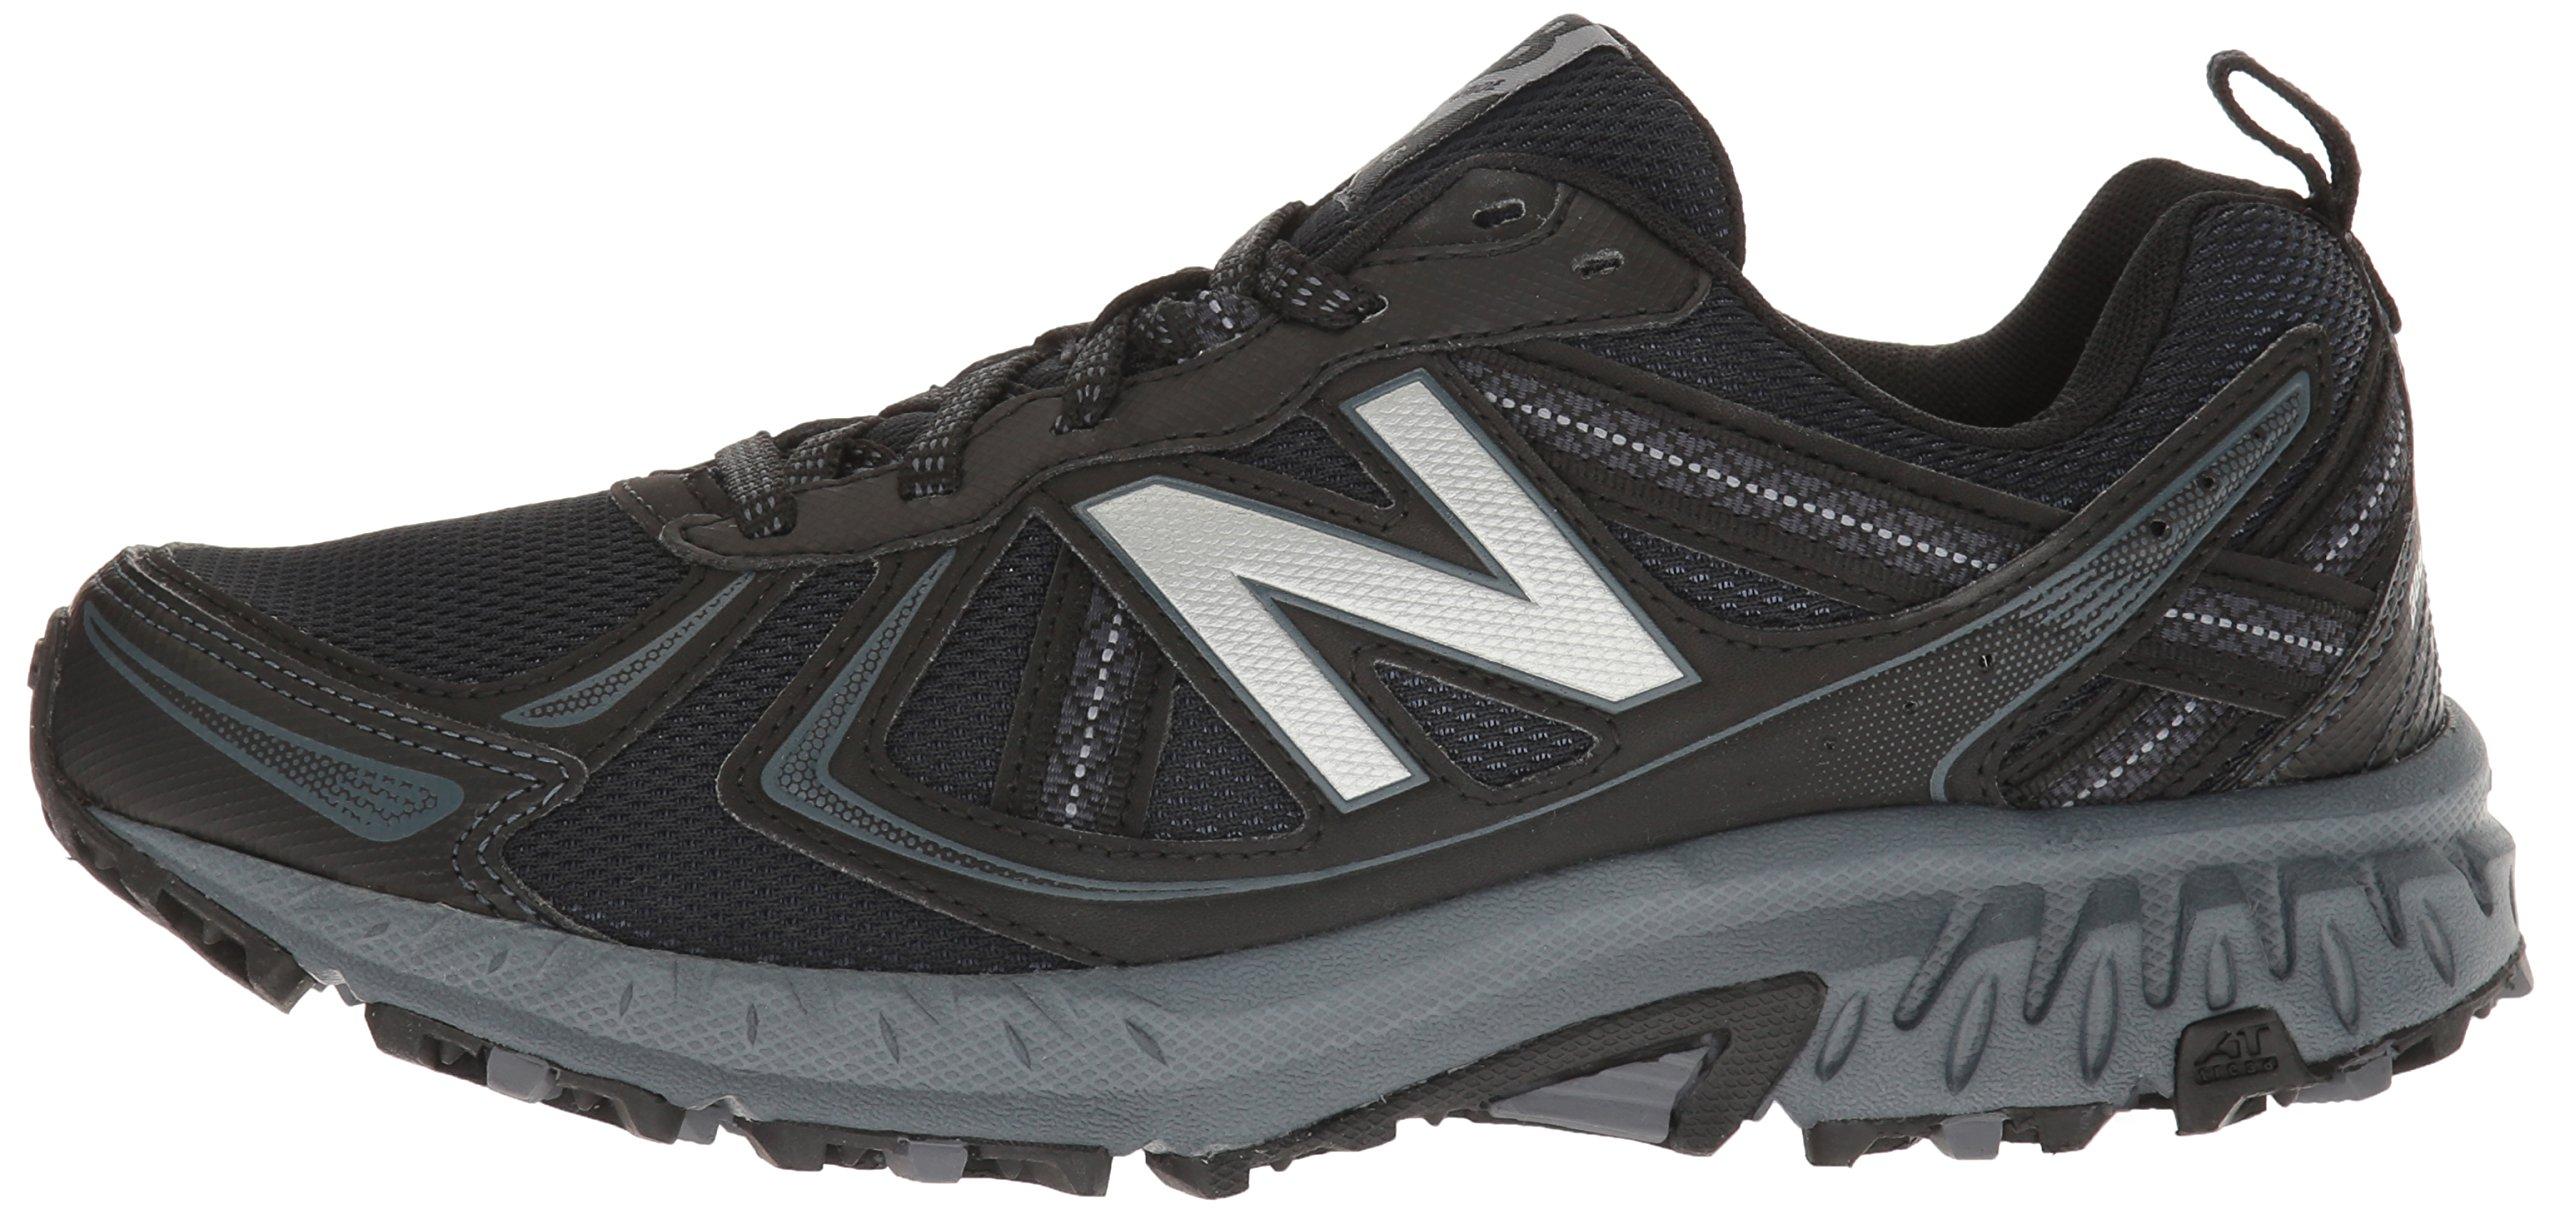 New Balance Men's MT410v5 Cushioning Trail Running Shoe, Black, 7 D US by New Balance (Image #5)